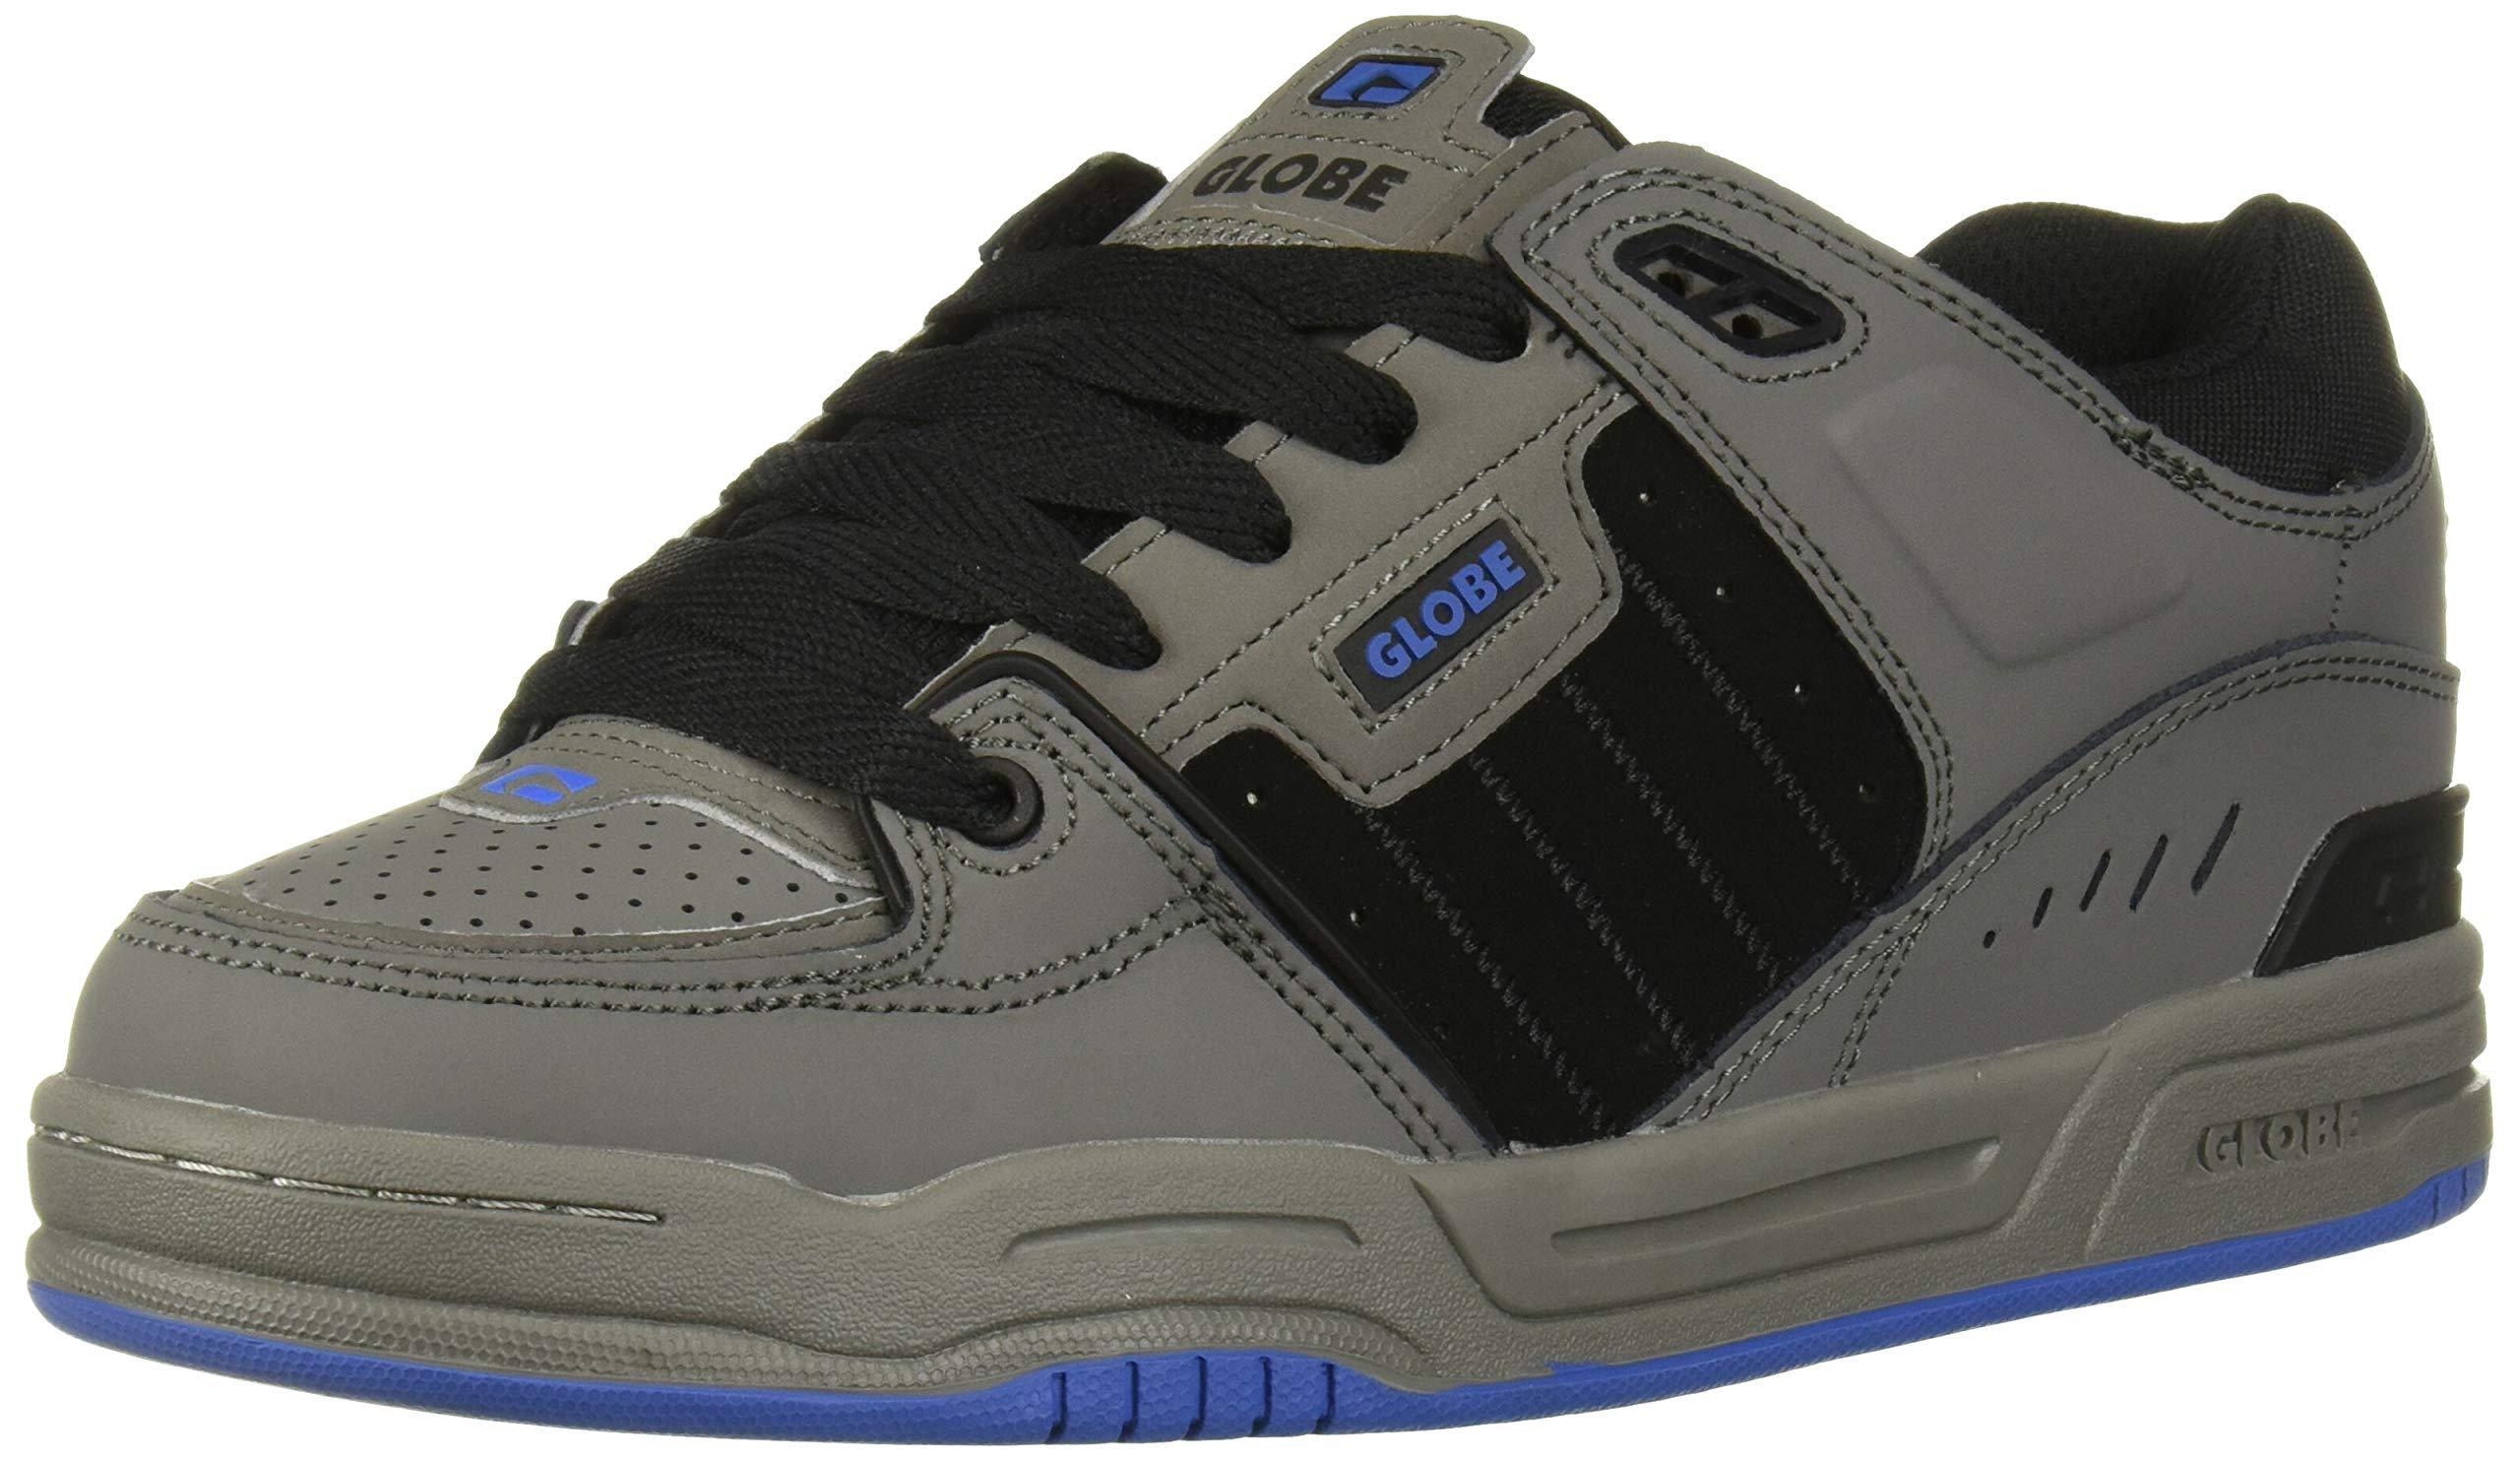 Globe Men's Fusion Skate Shoe, Charcoal/Black/Blue, 7.5 Medium US by Globe